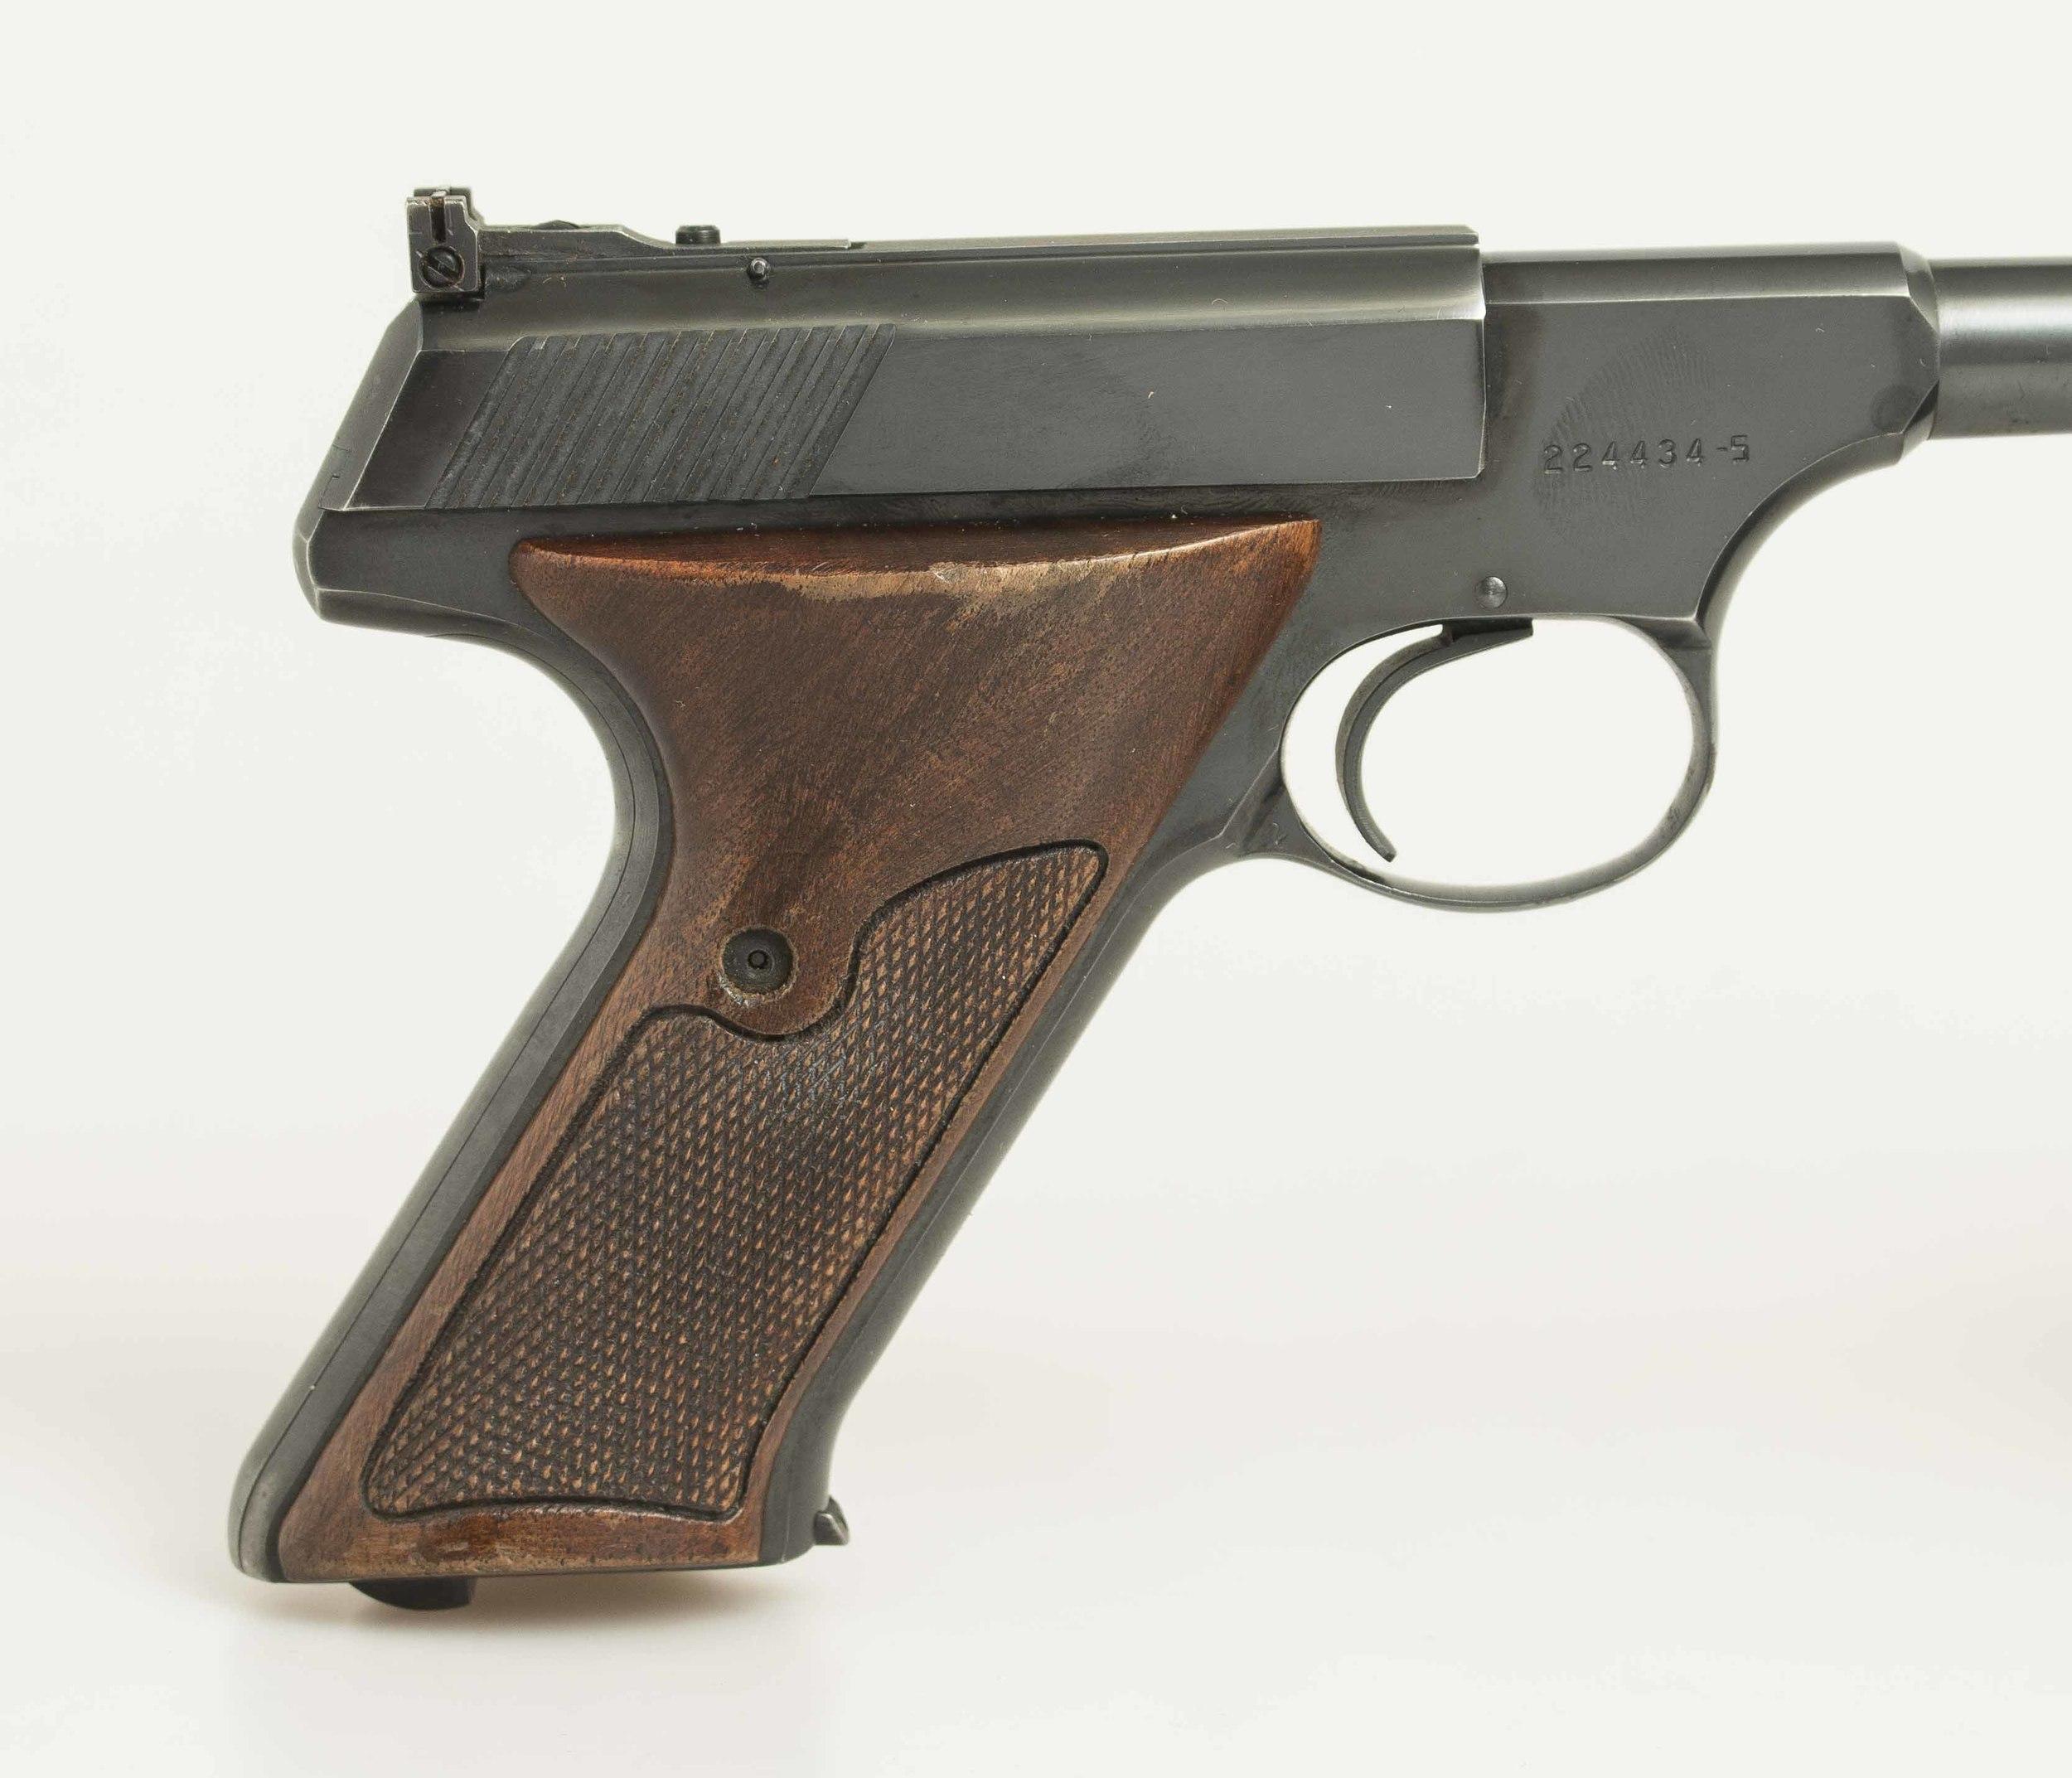 Colt Woodsman  22 Pistol in original Colt Box with paperwork